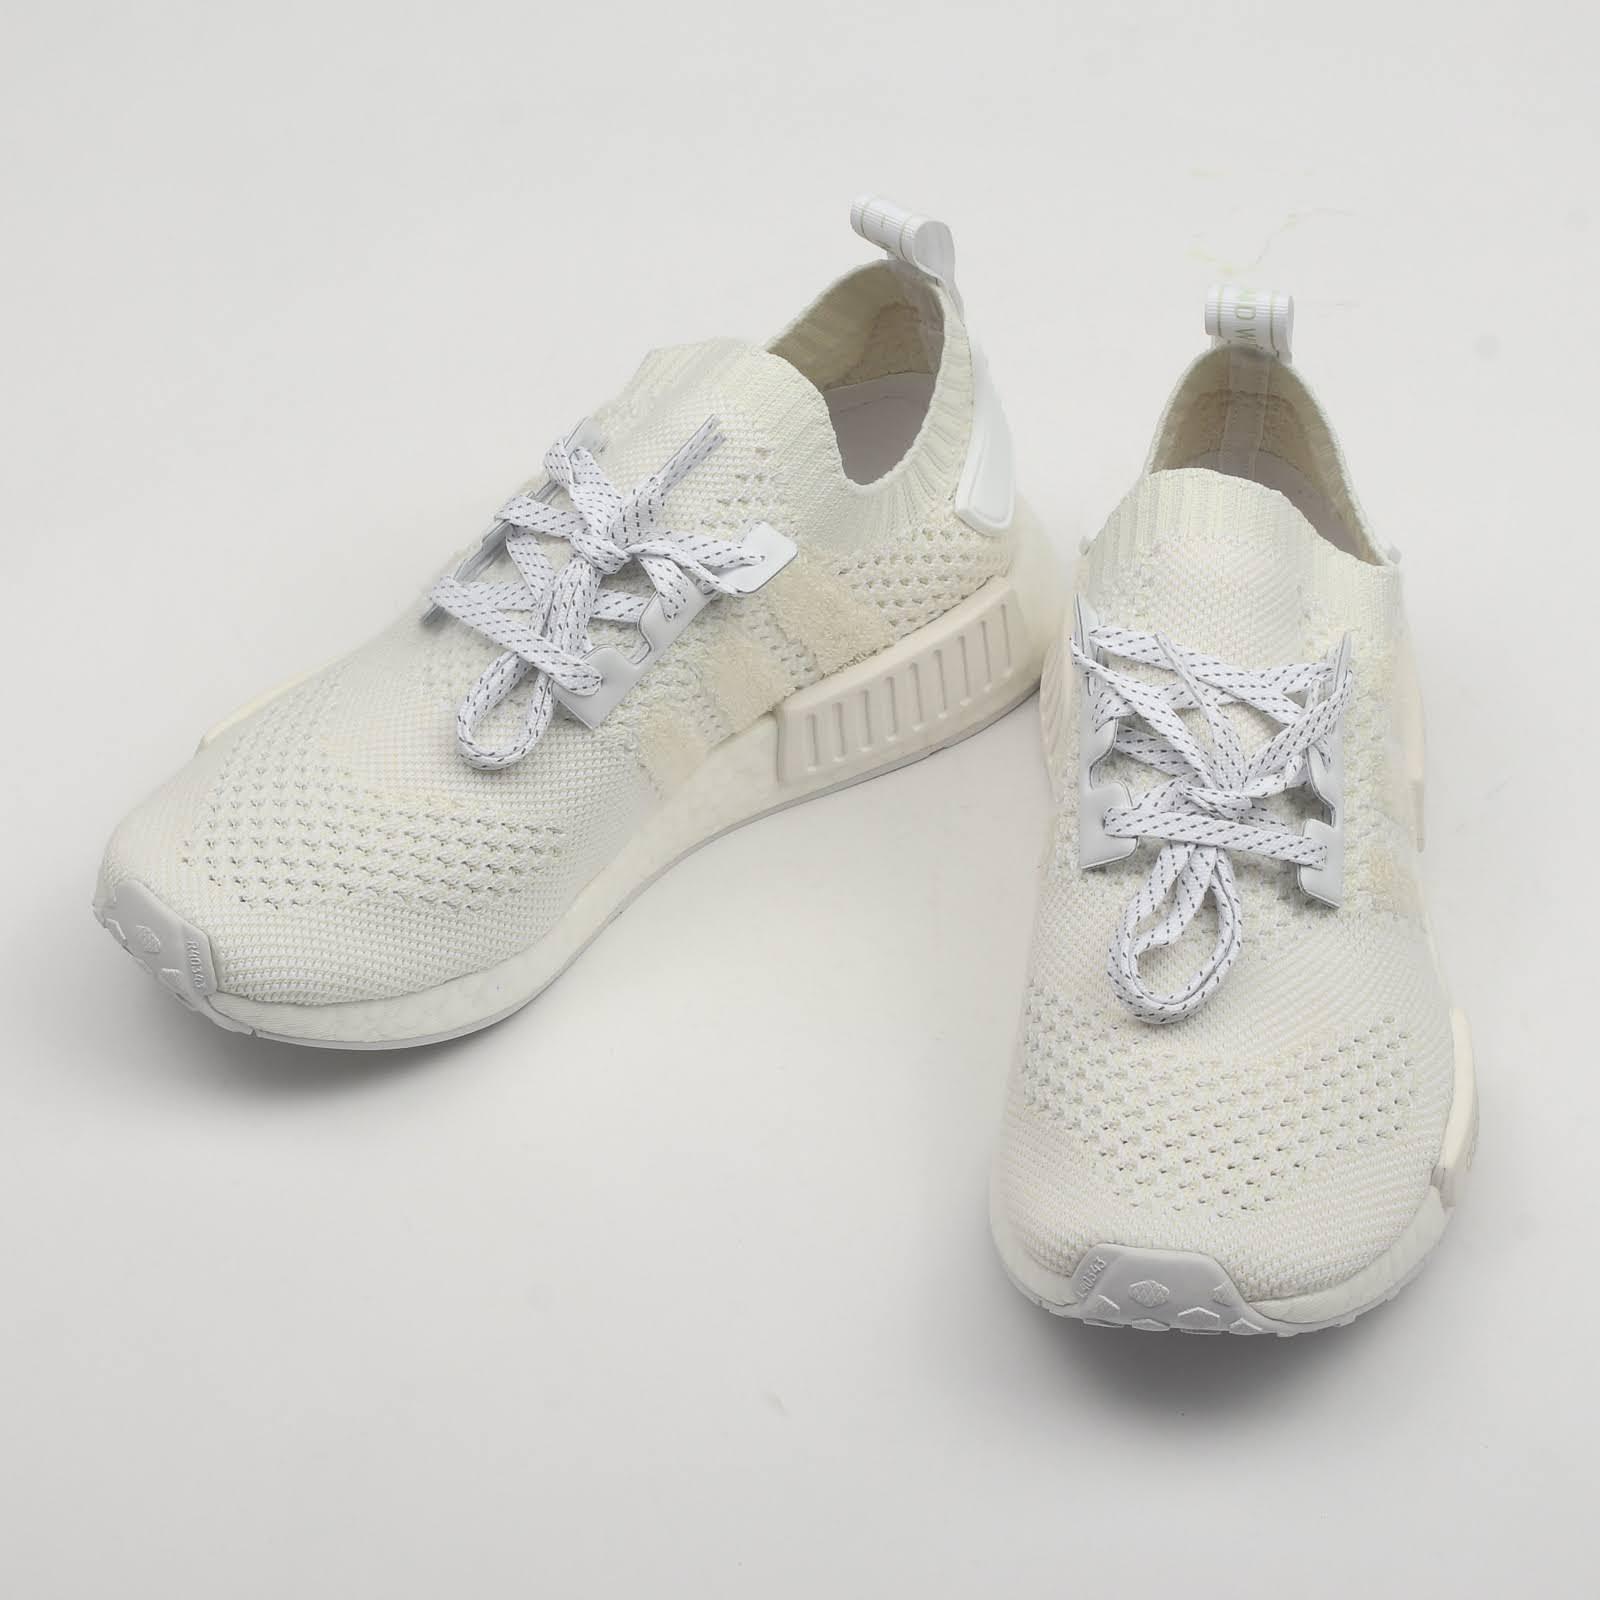 Adidas Calzature BiancoLino Pk r1 Verde White Nmd TJKFc1l